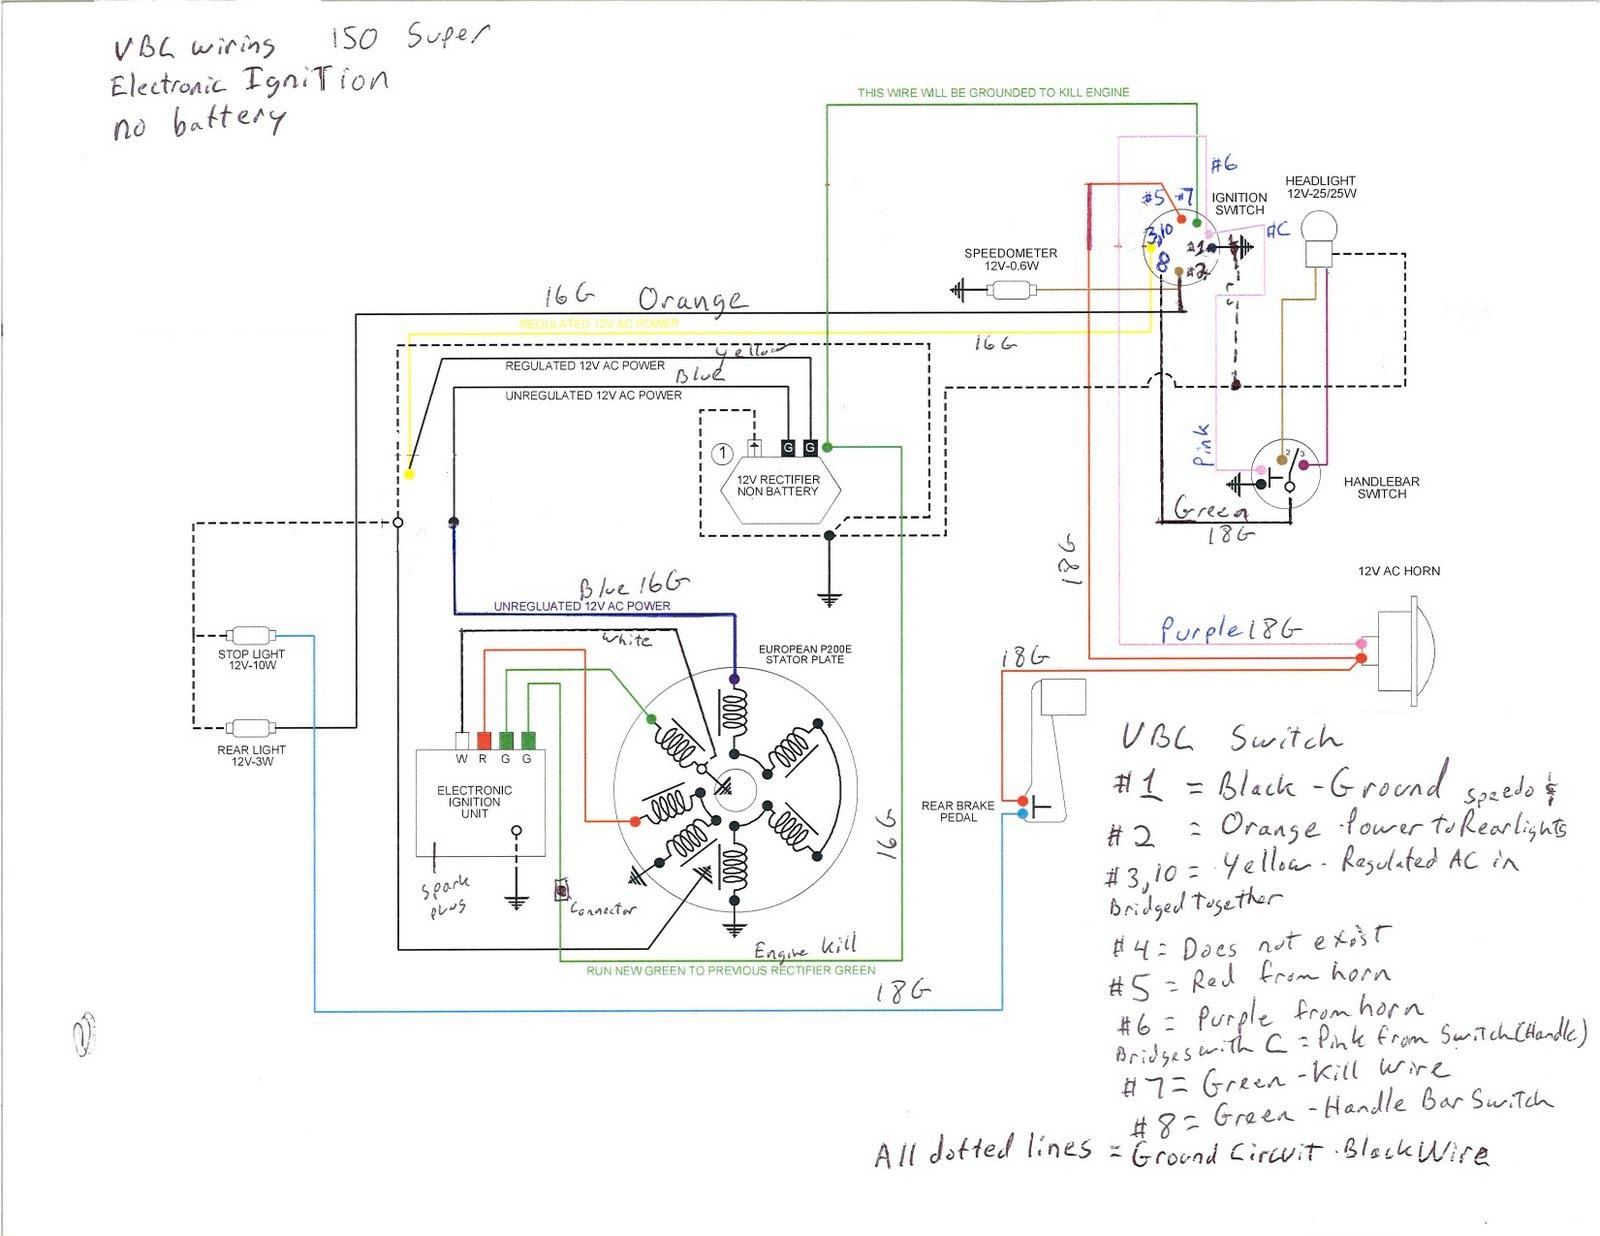 2001 saturn sc2 stereo wiring diagram wiring diagram rh wiring1 ennosbobbelparty1 de